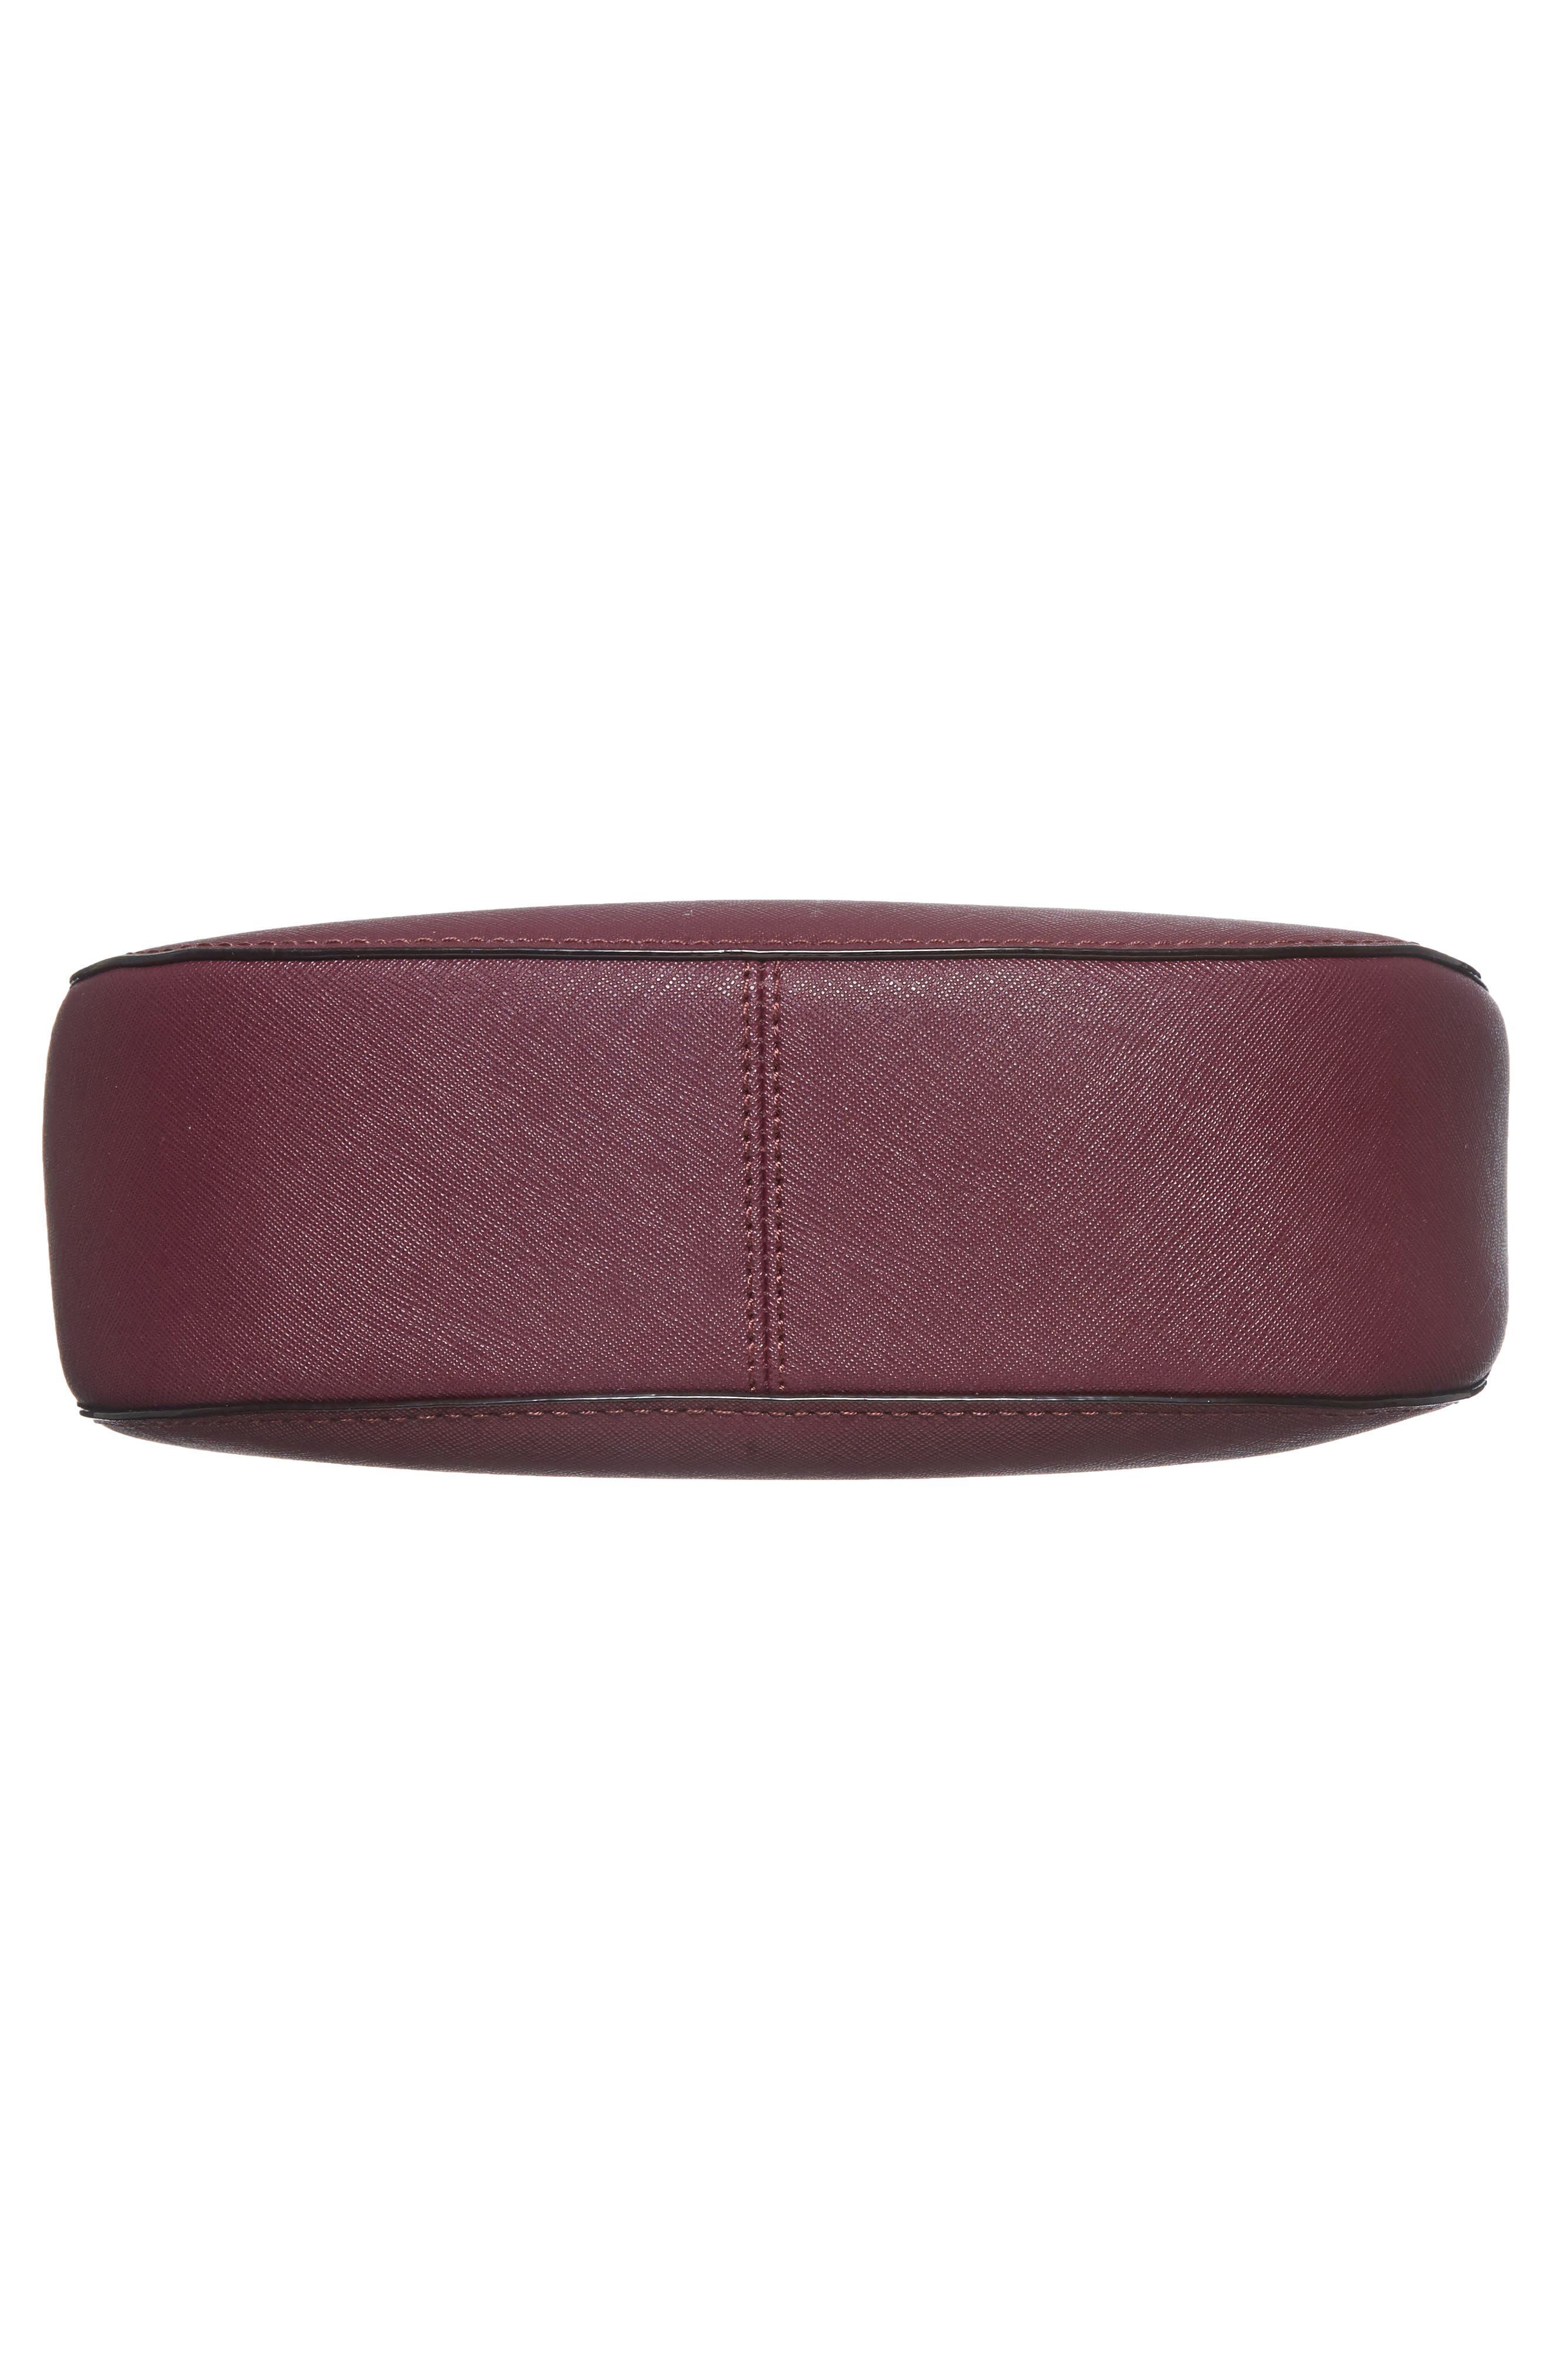 cameron street - robin leather crossbody bag,                             Alternate thumbnail 5, color,                             Deep Plum